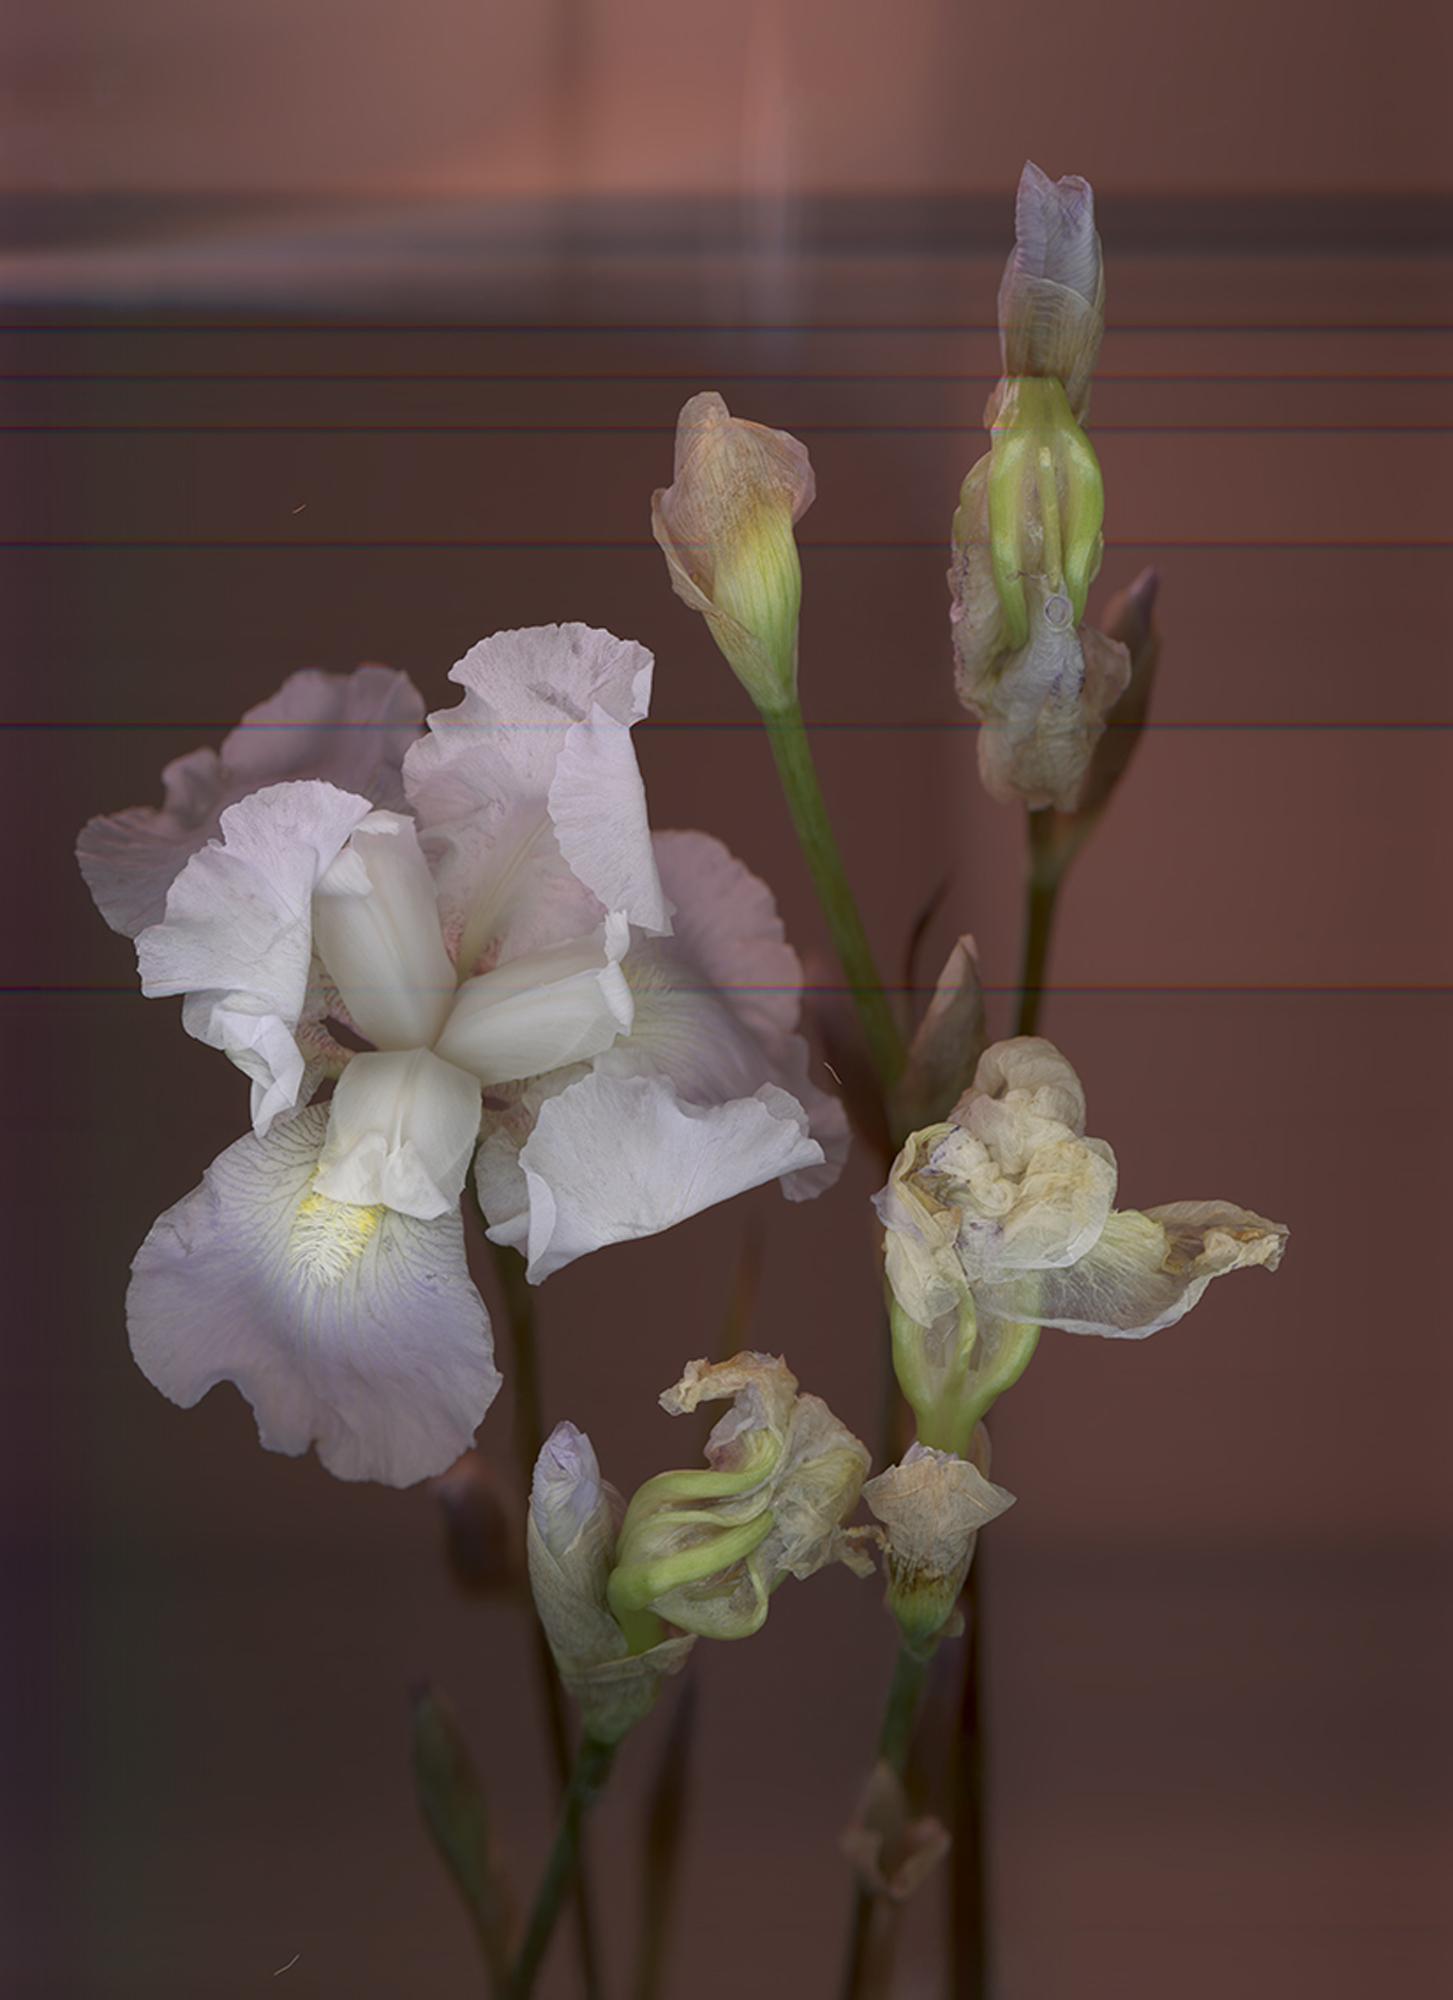 anna-skladmann-IRIS_02_retouched_WEB.jpg